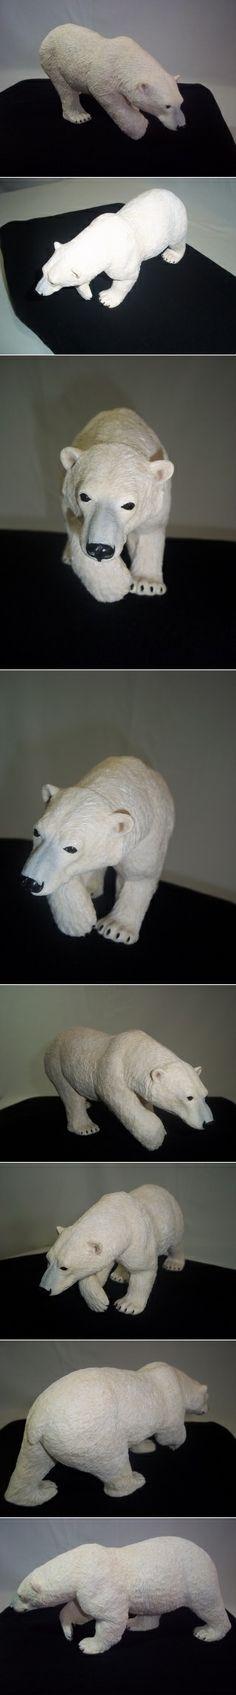 Polar Bear Statue Figurine  Perfect for this Holiday Season